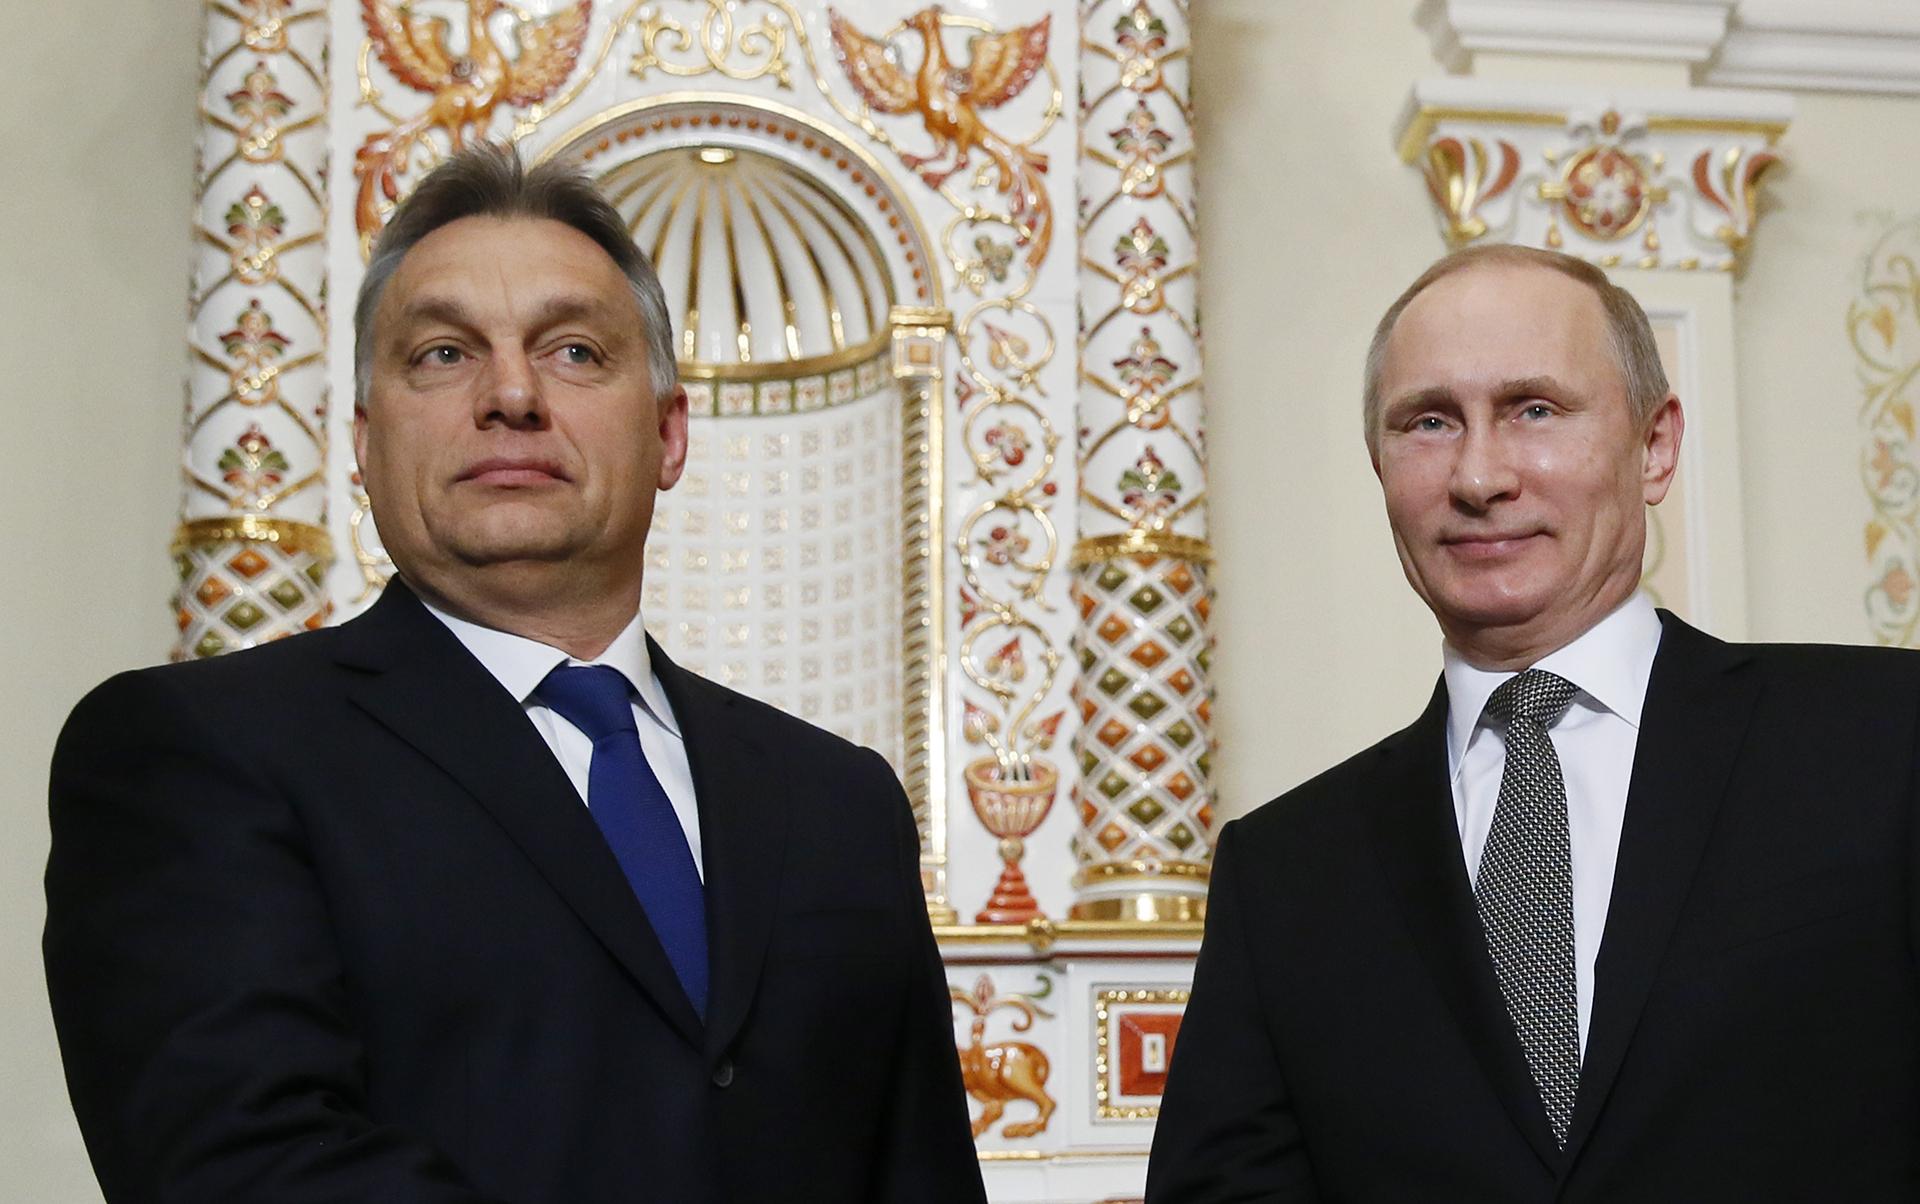 AFP PHOTO / POOL/ YURI KOCHETKOV